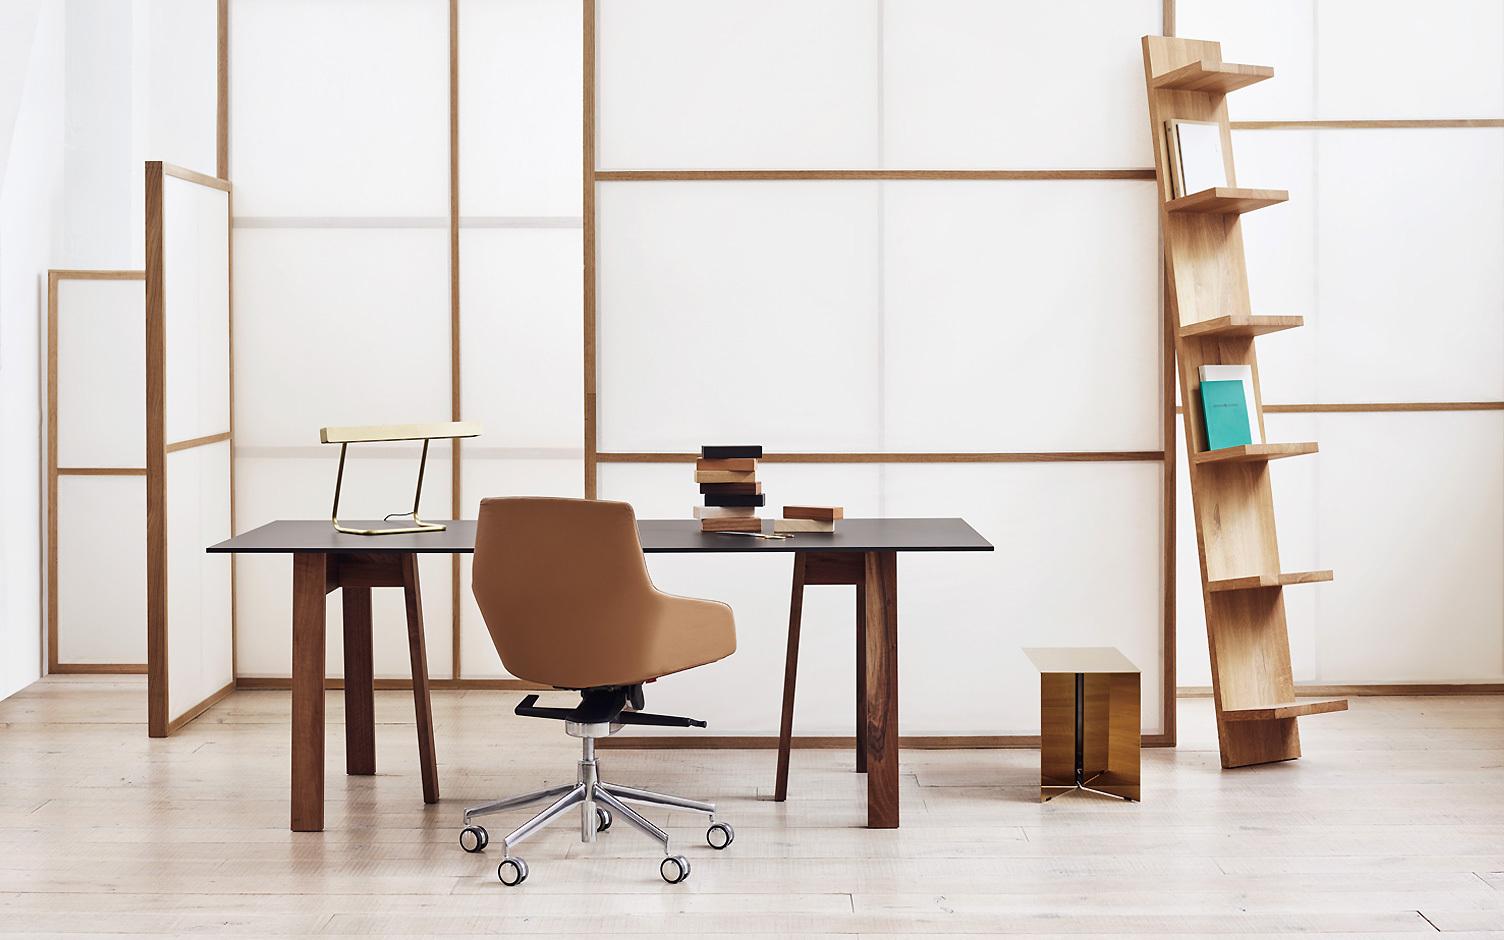 Workspace catalogue image